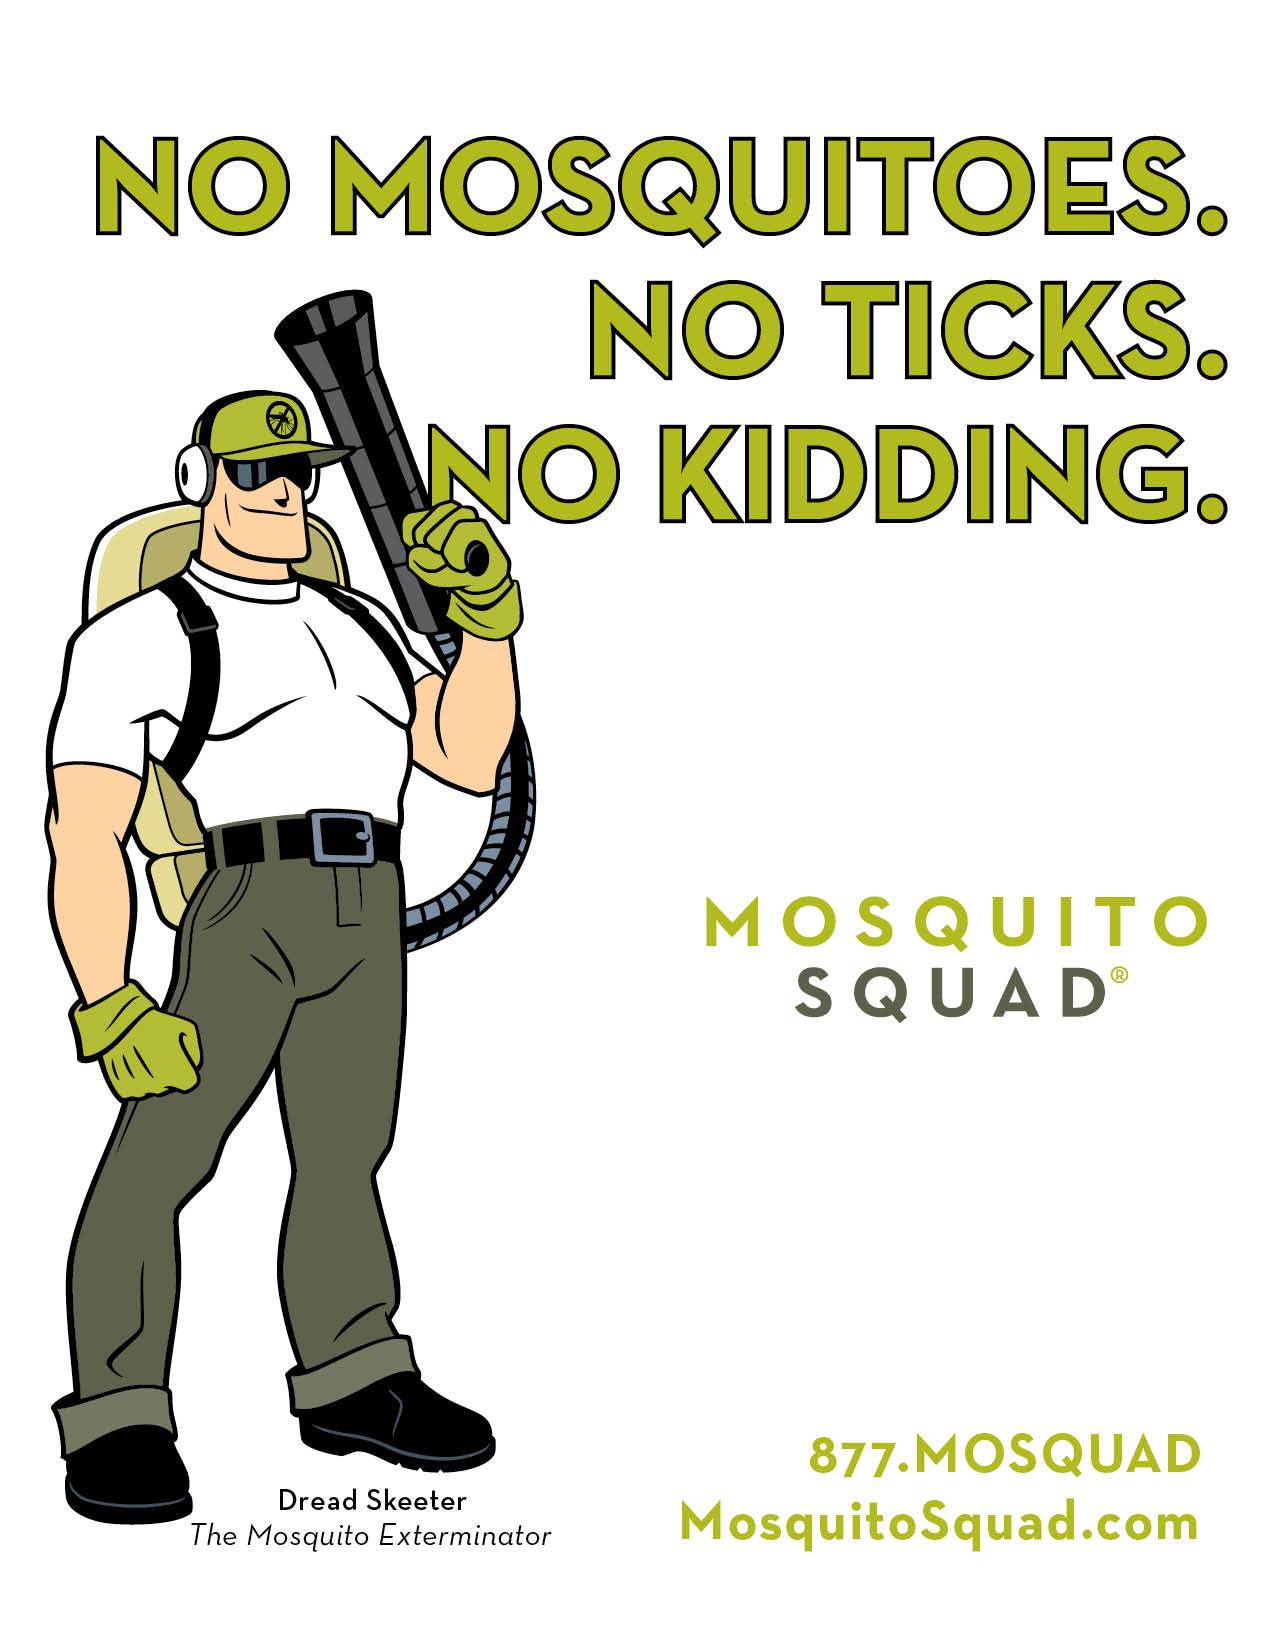 Mosquito Squad Launches New Mosquito Control Website